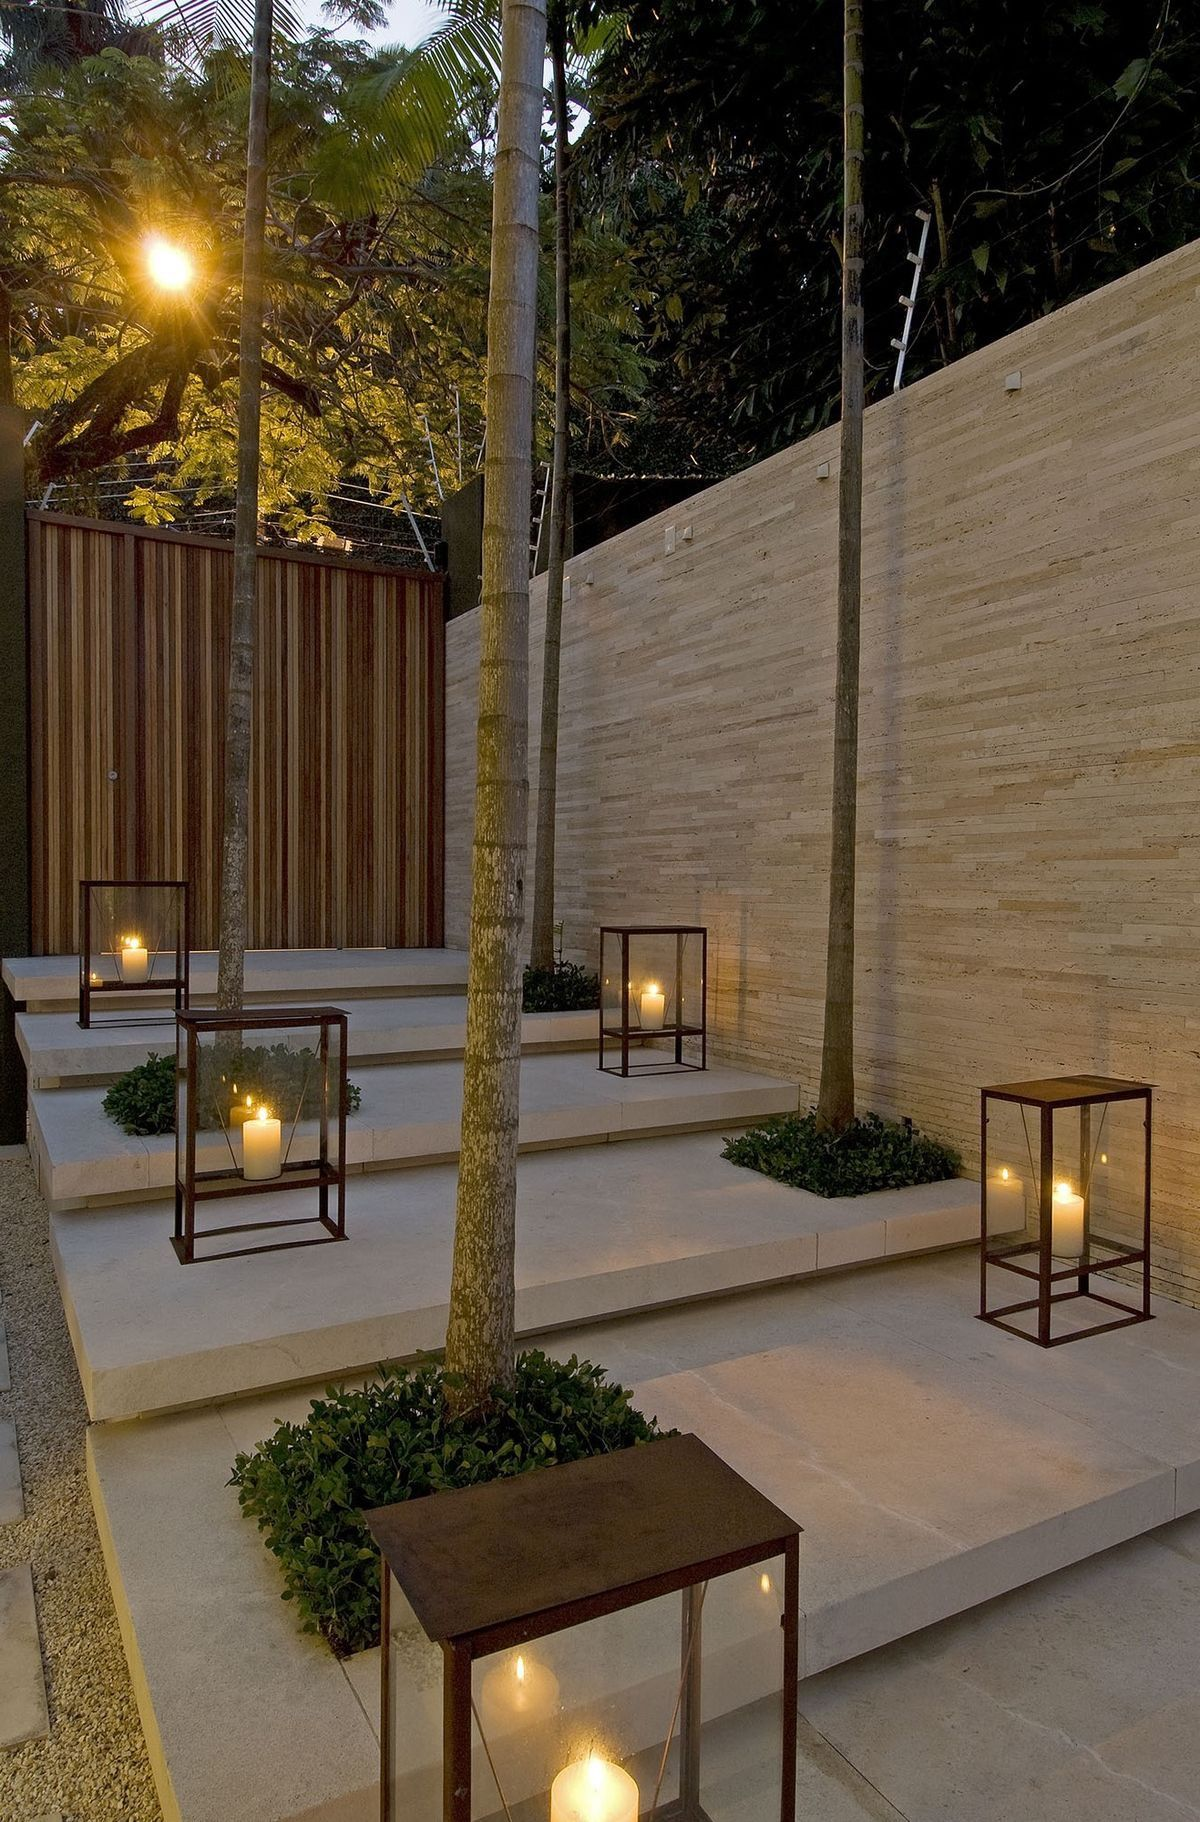 Pin de angie conte en exteriores de fachadas y pasillos for Terraza decoracion apartamento al aire libre